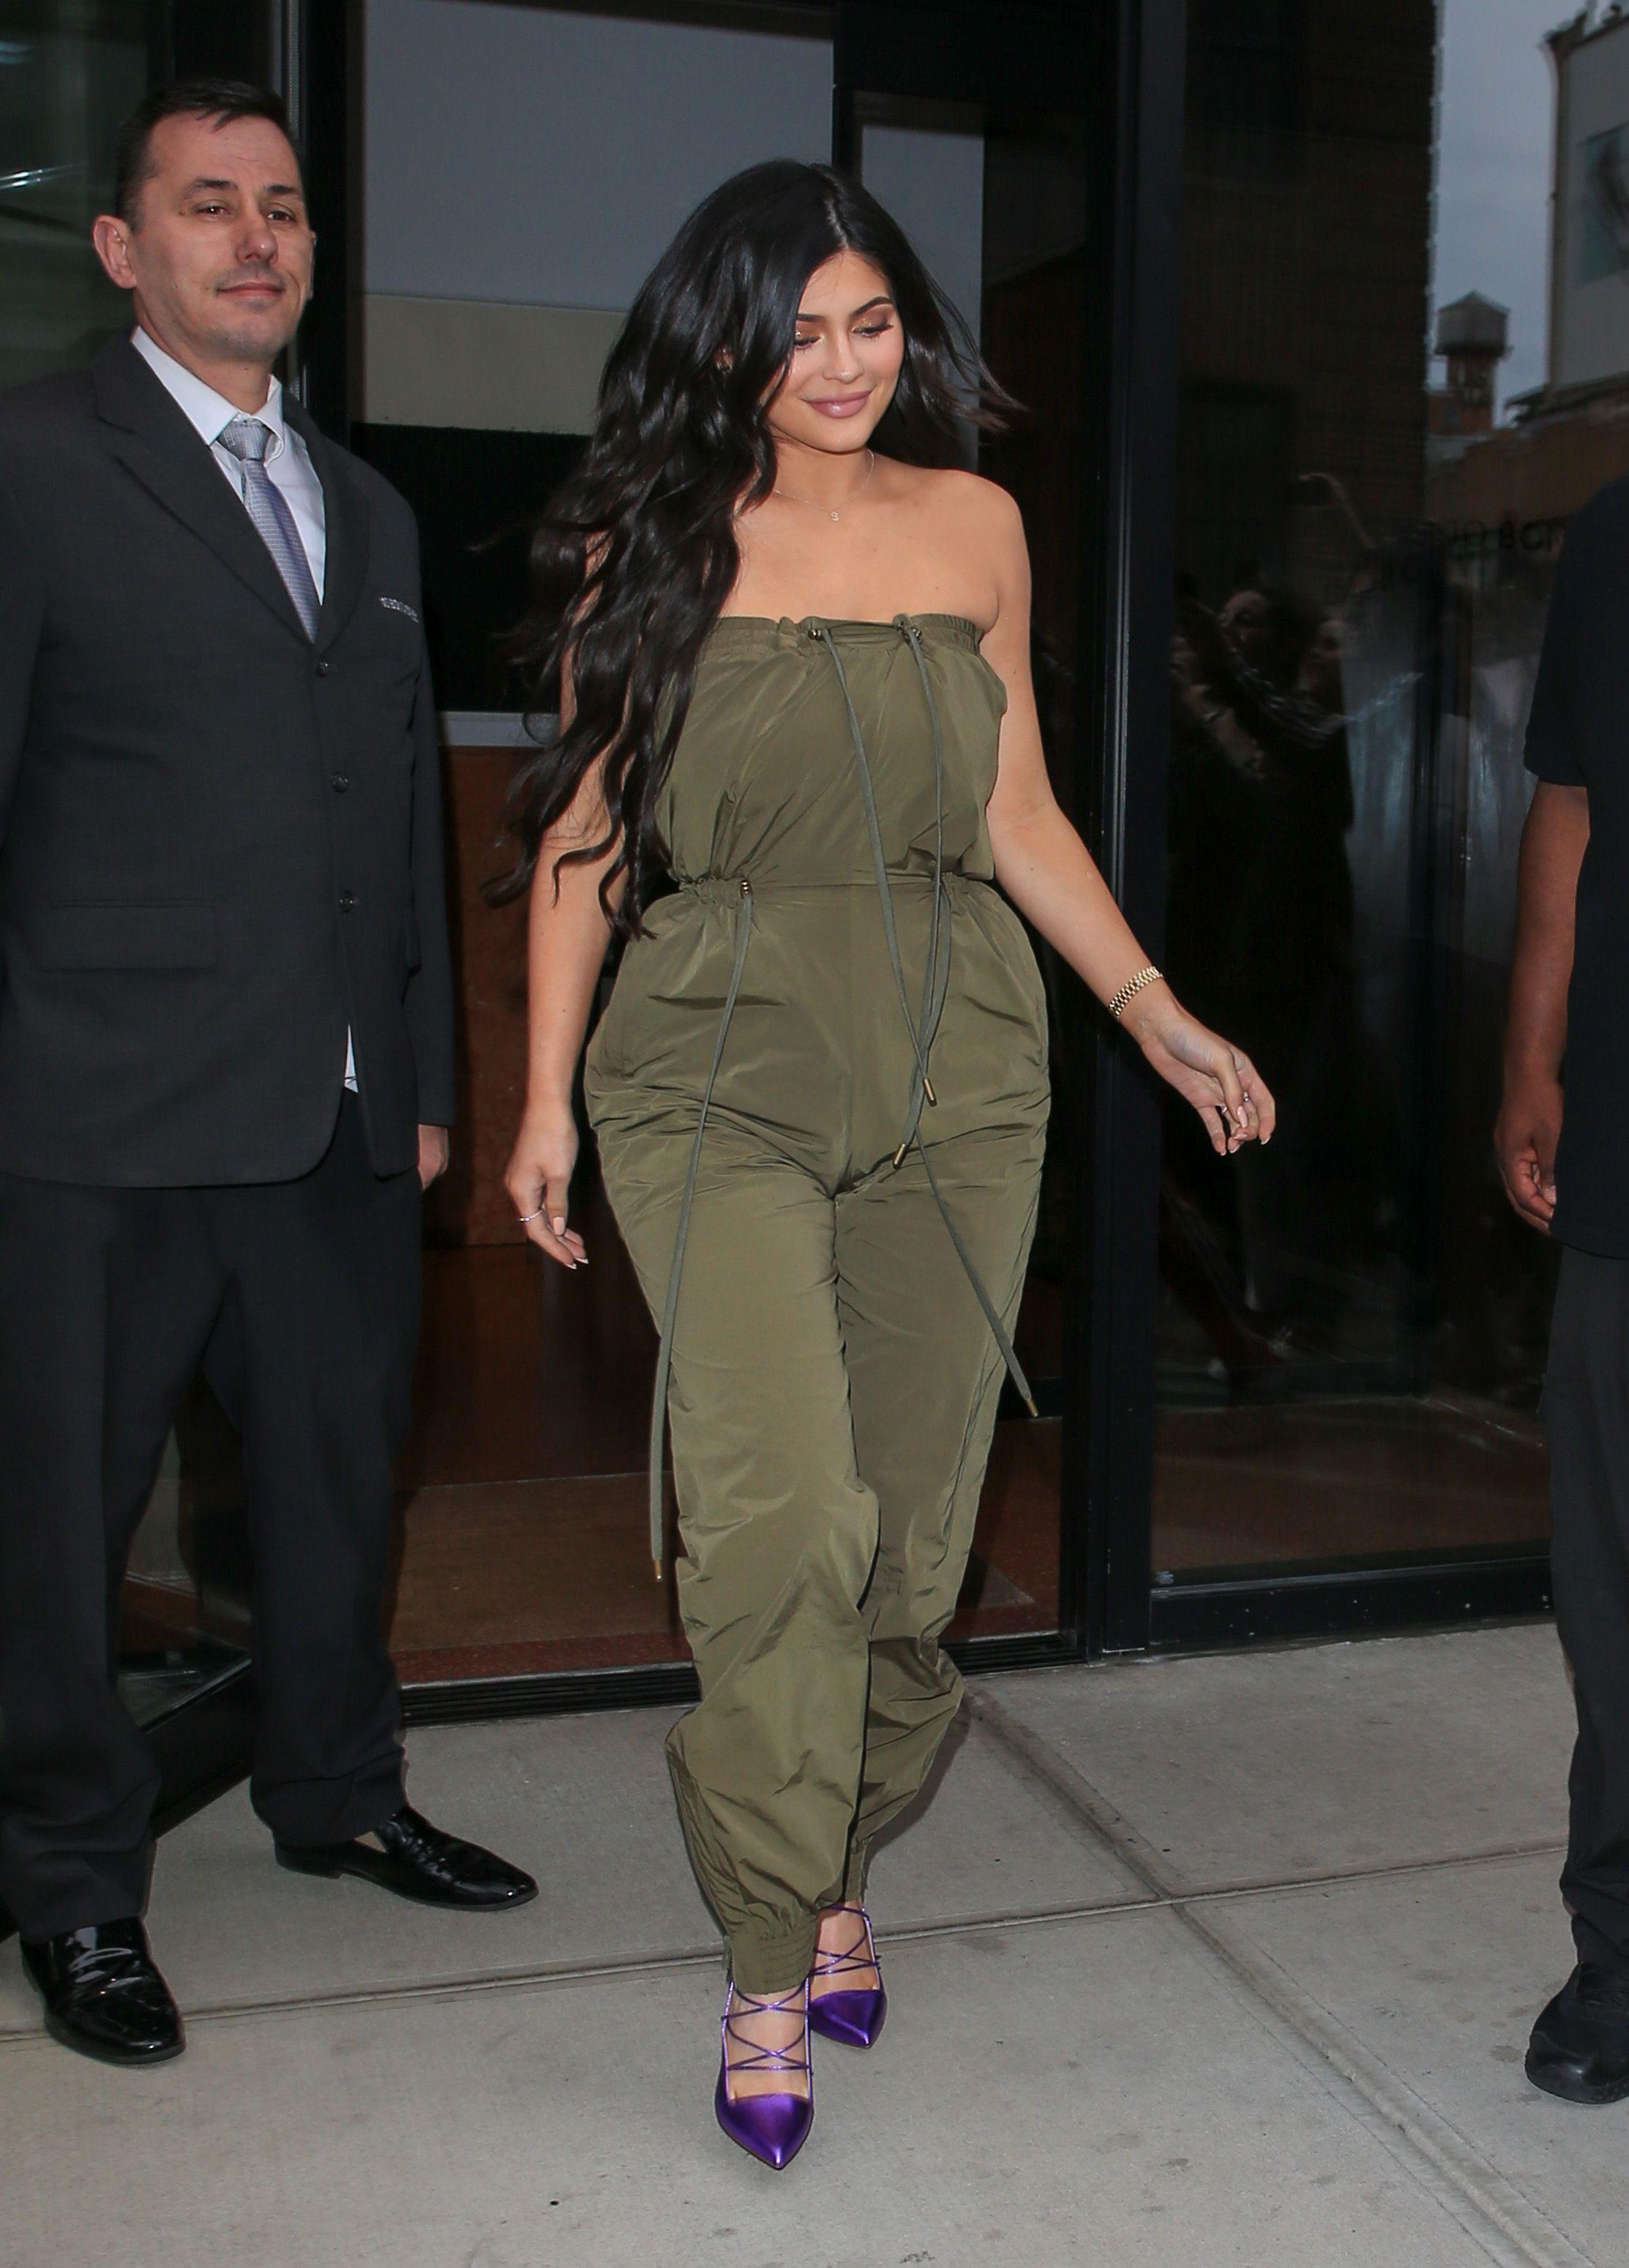 e4eb0ab5754 Kylie Jenner Style Evolution - Kylie Jenner Through the Years Photos